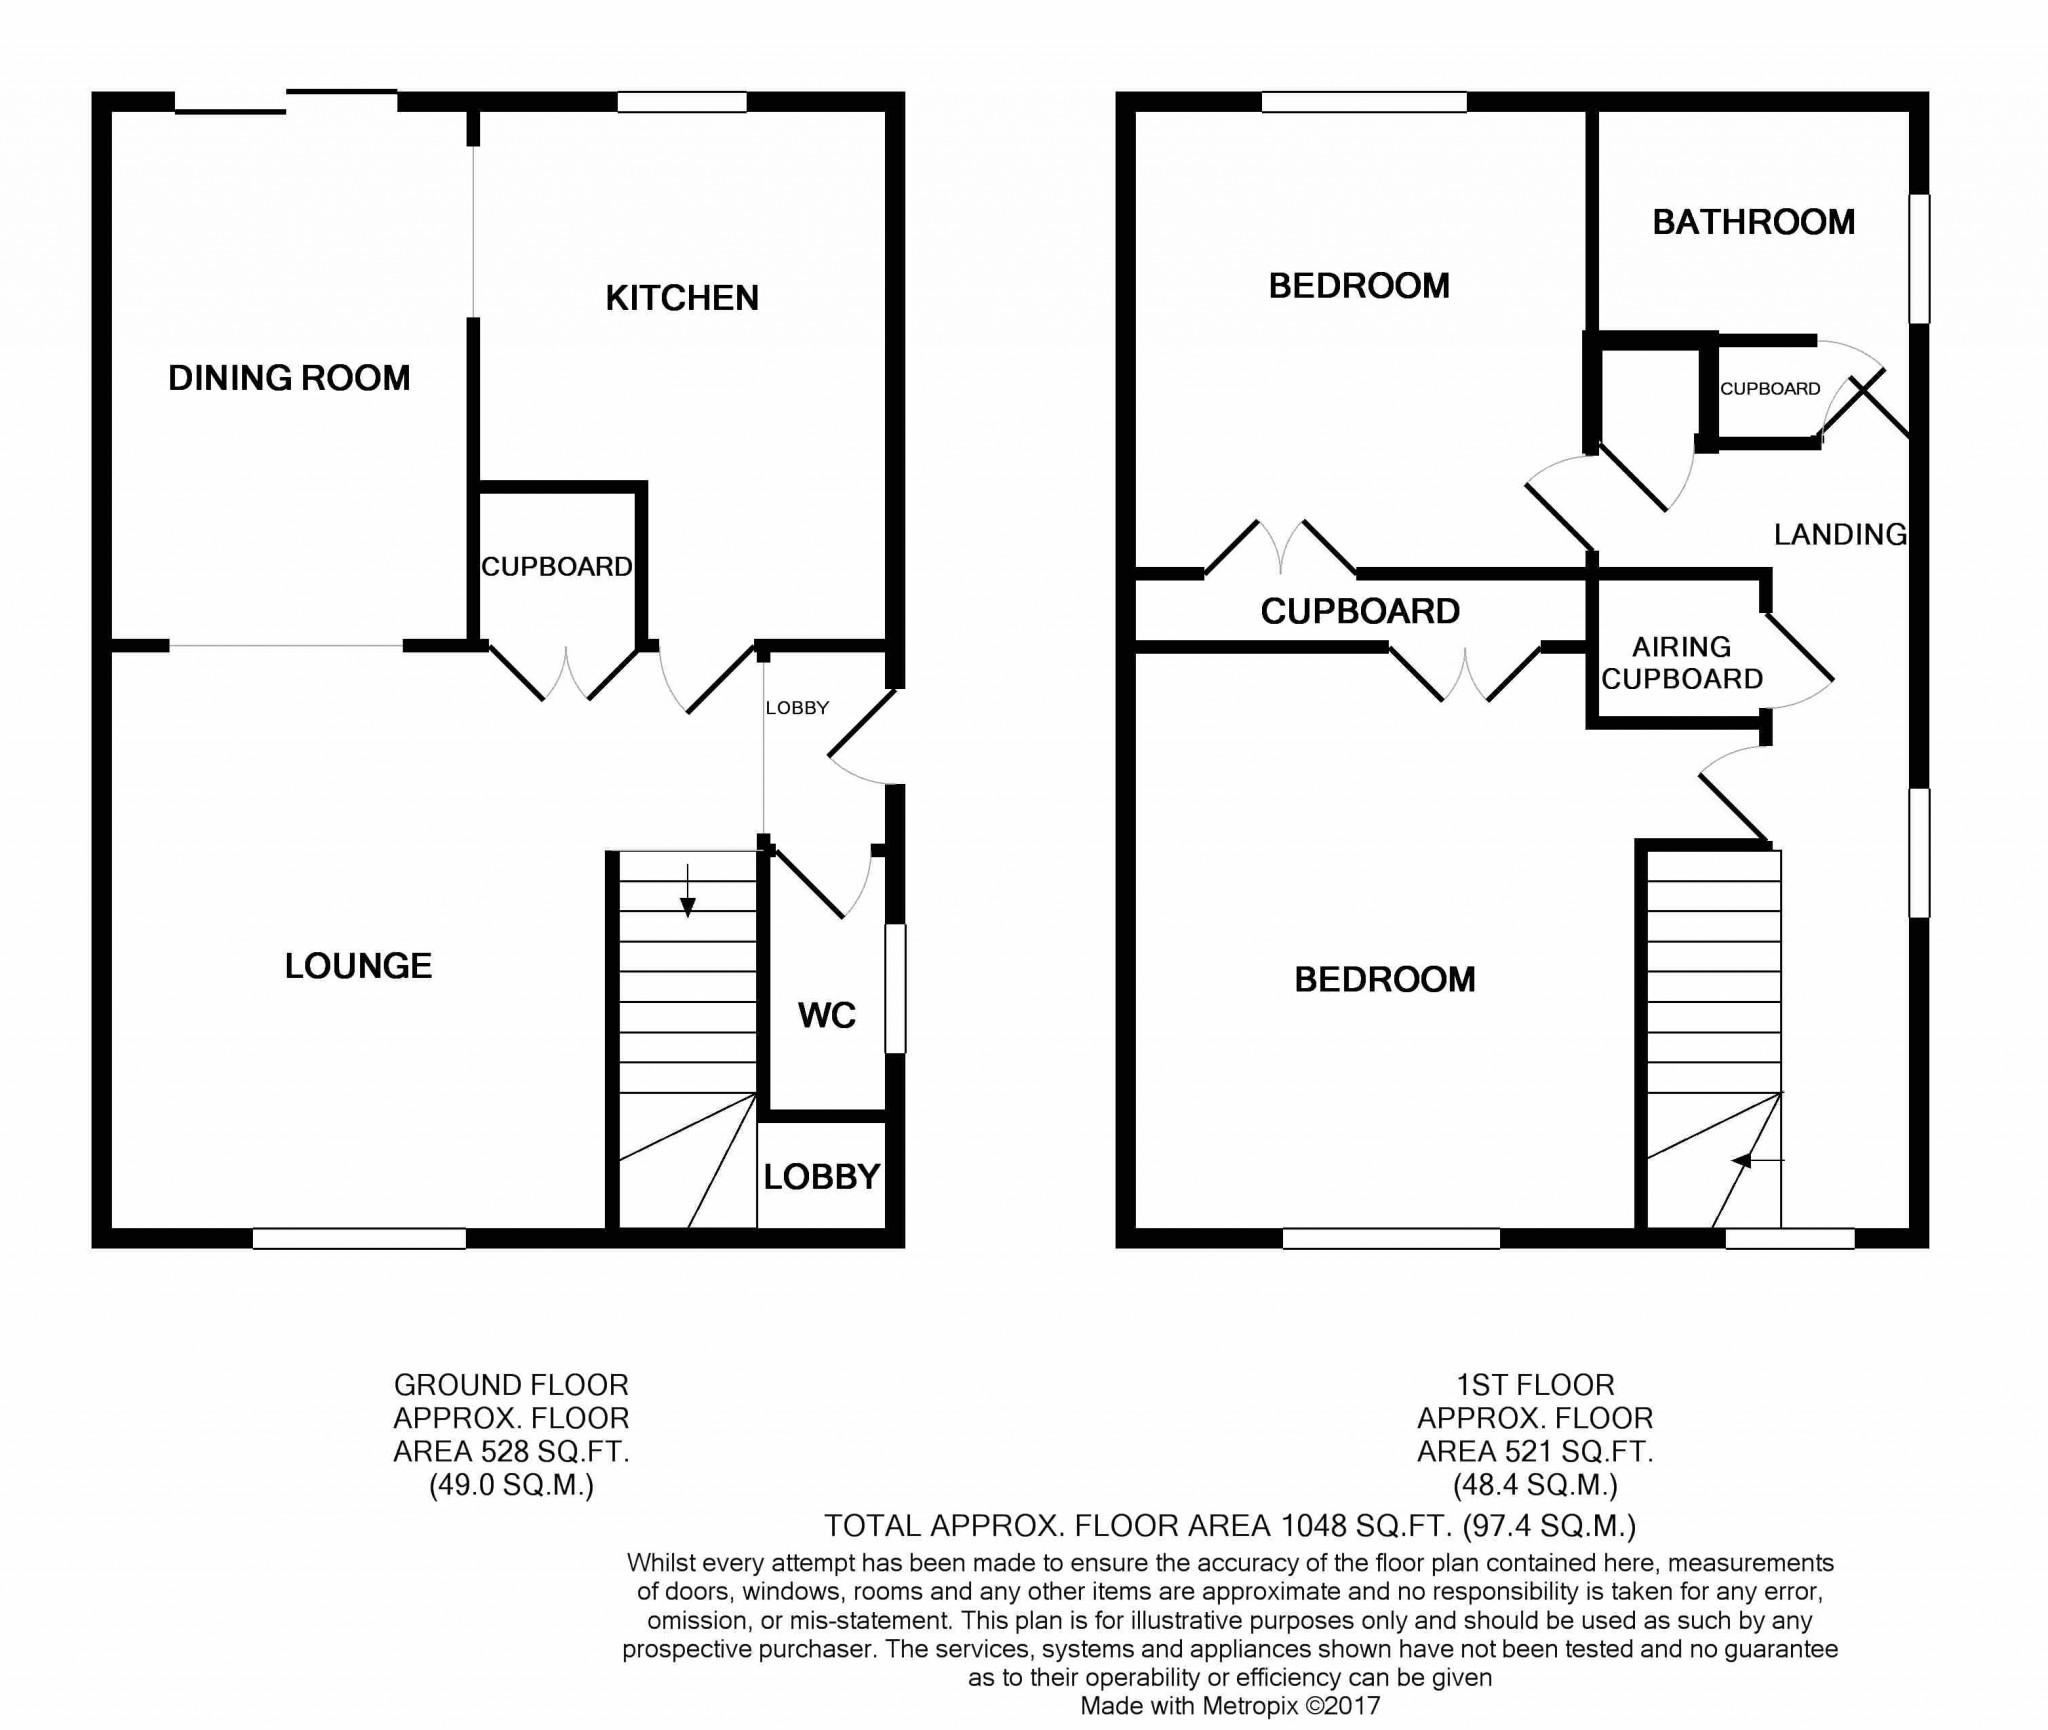 2 bedroom semi-detached house SSTC in Rendlesham, Woodbridge - Floorplan 1